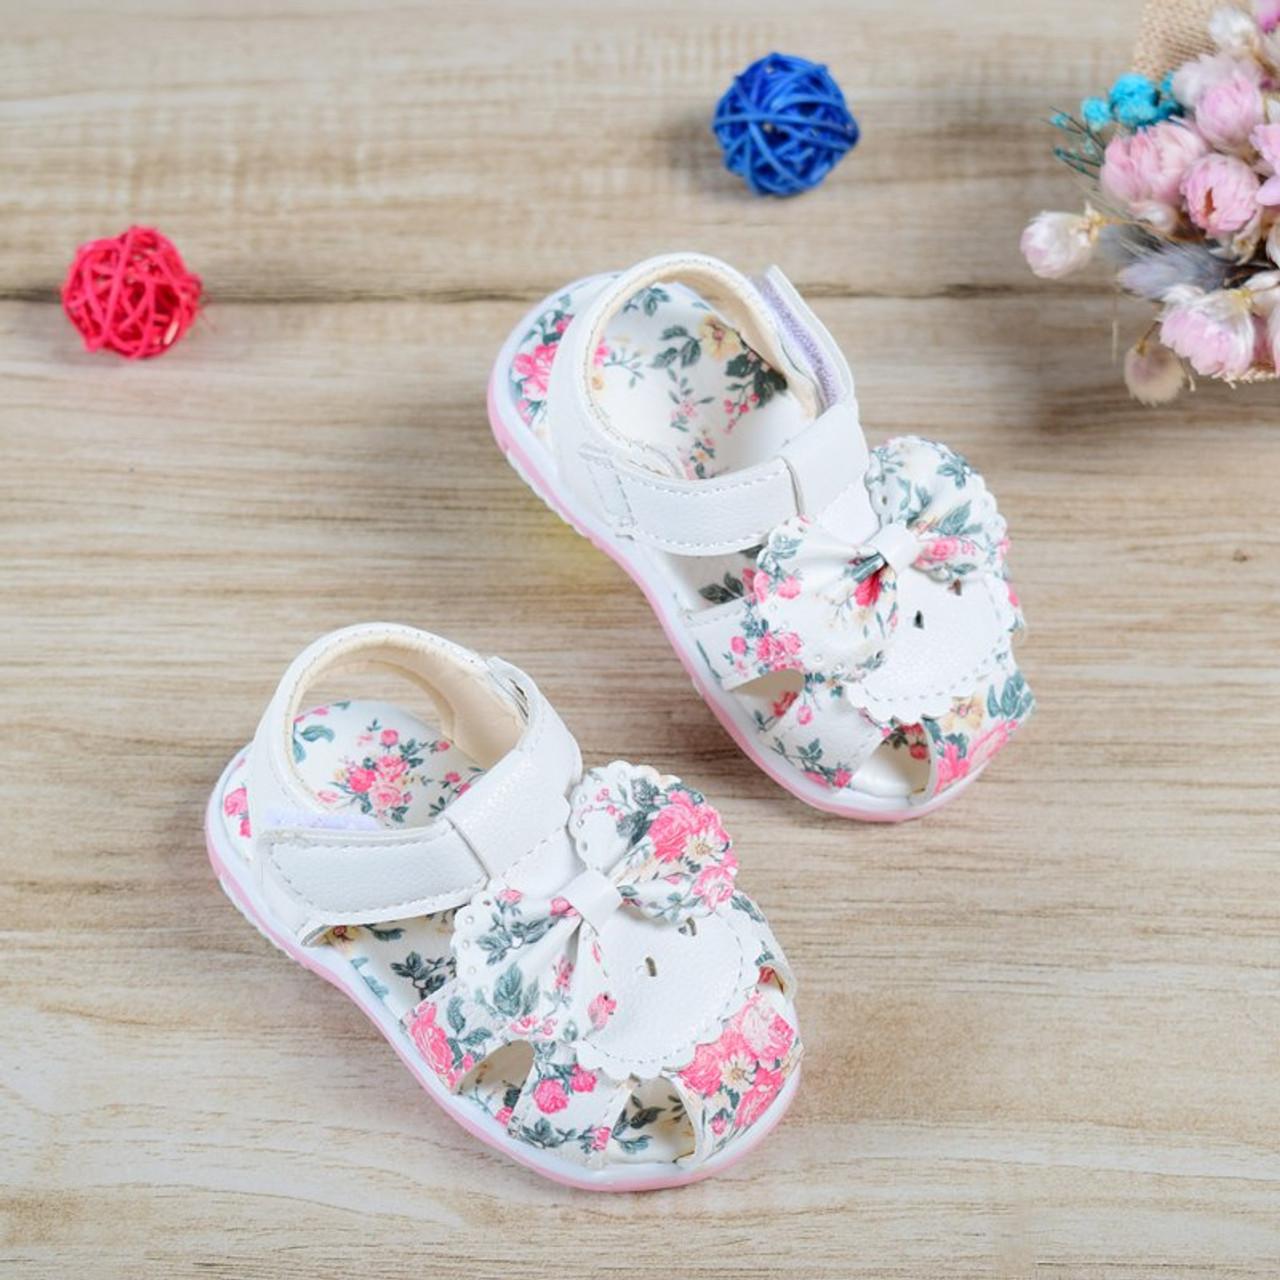 ... 2018 Baby Sandals Newborn Baby Girl Sandals Summer Flower Baby Shoes  Anti-Slip Closed Toe ...